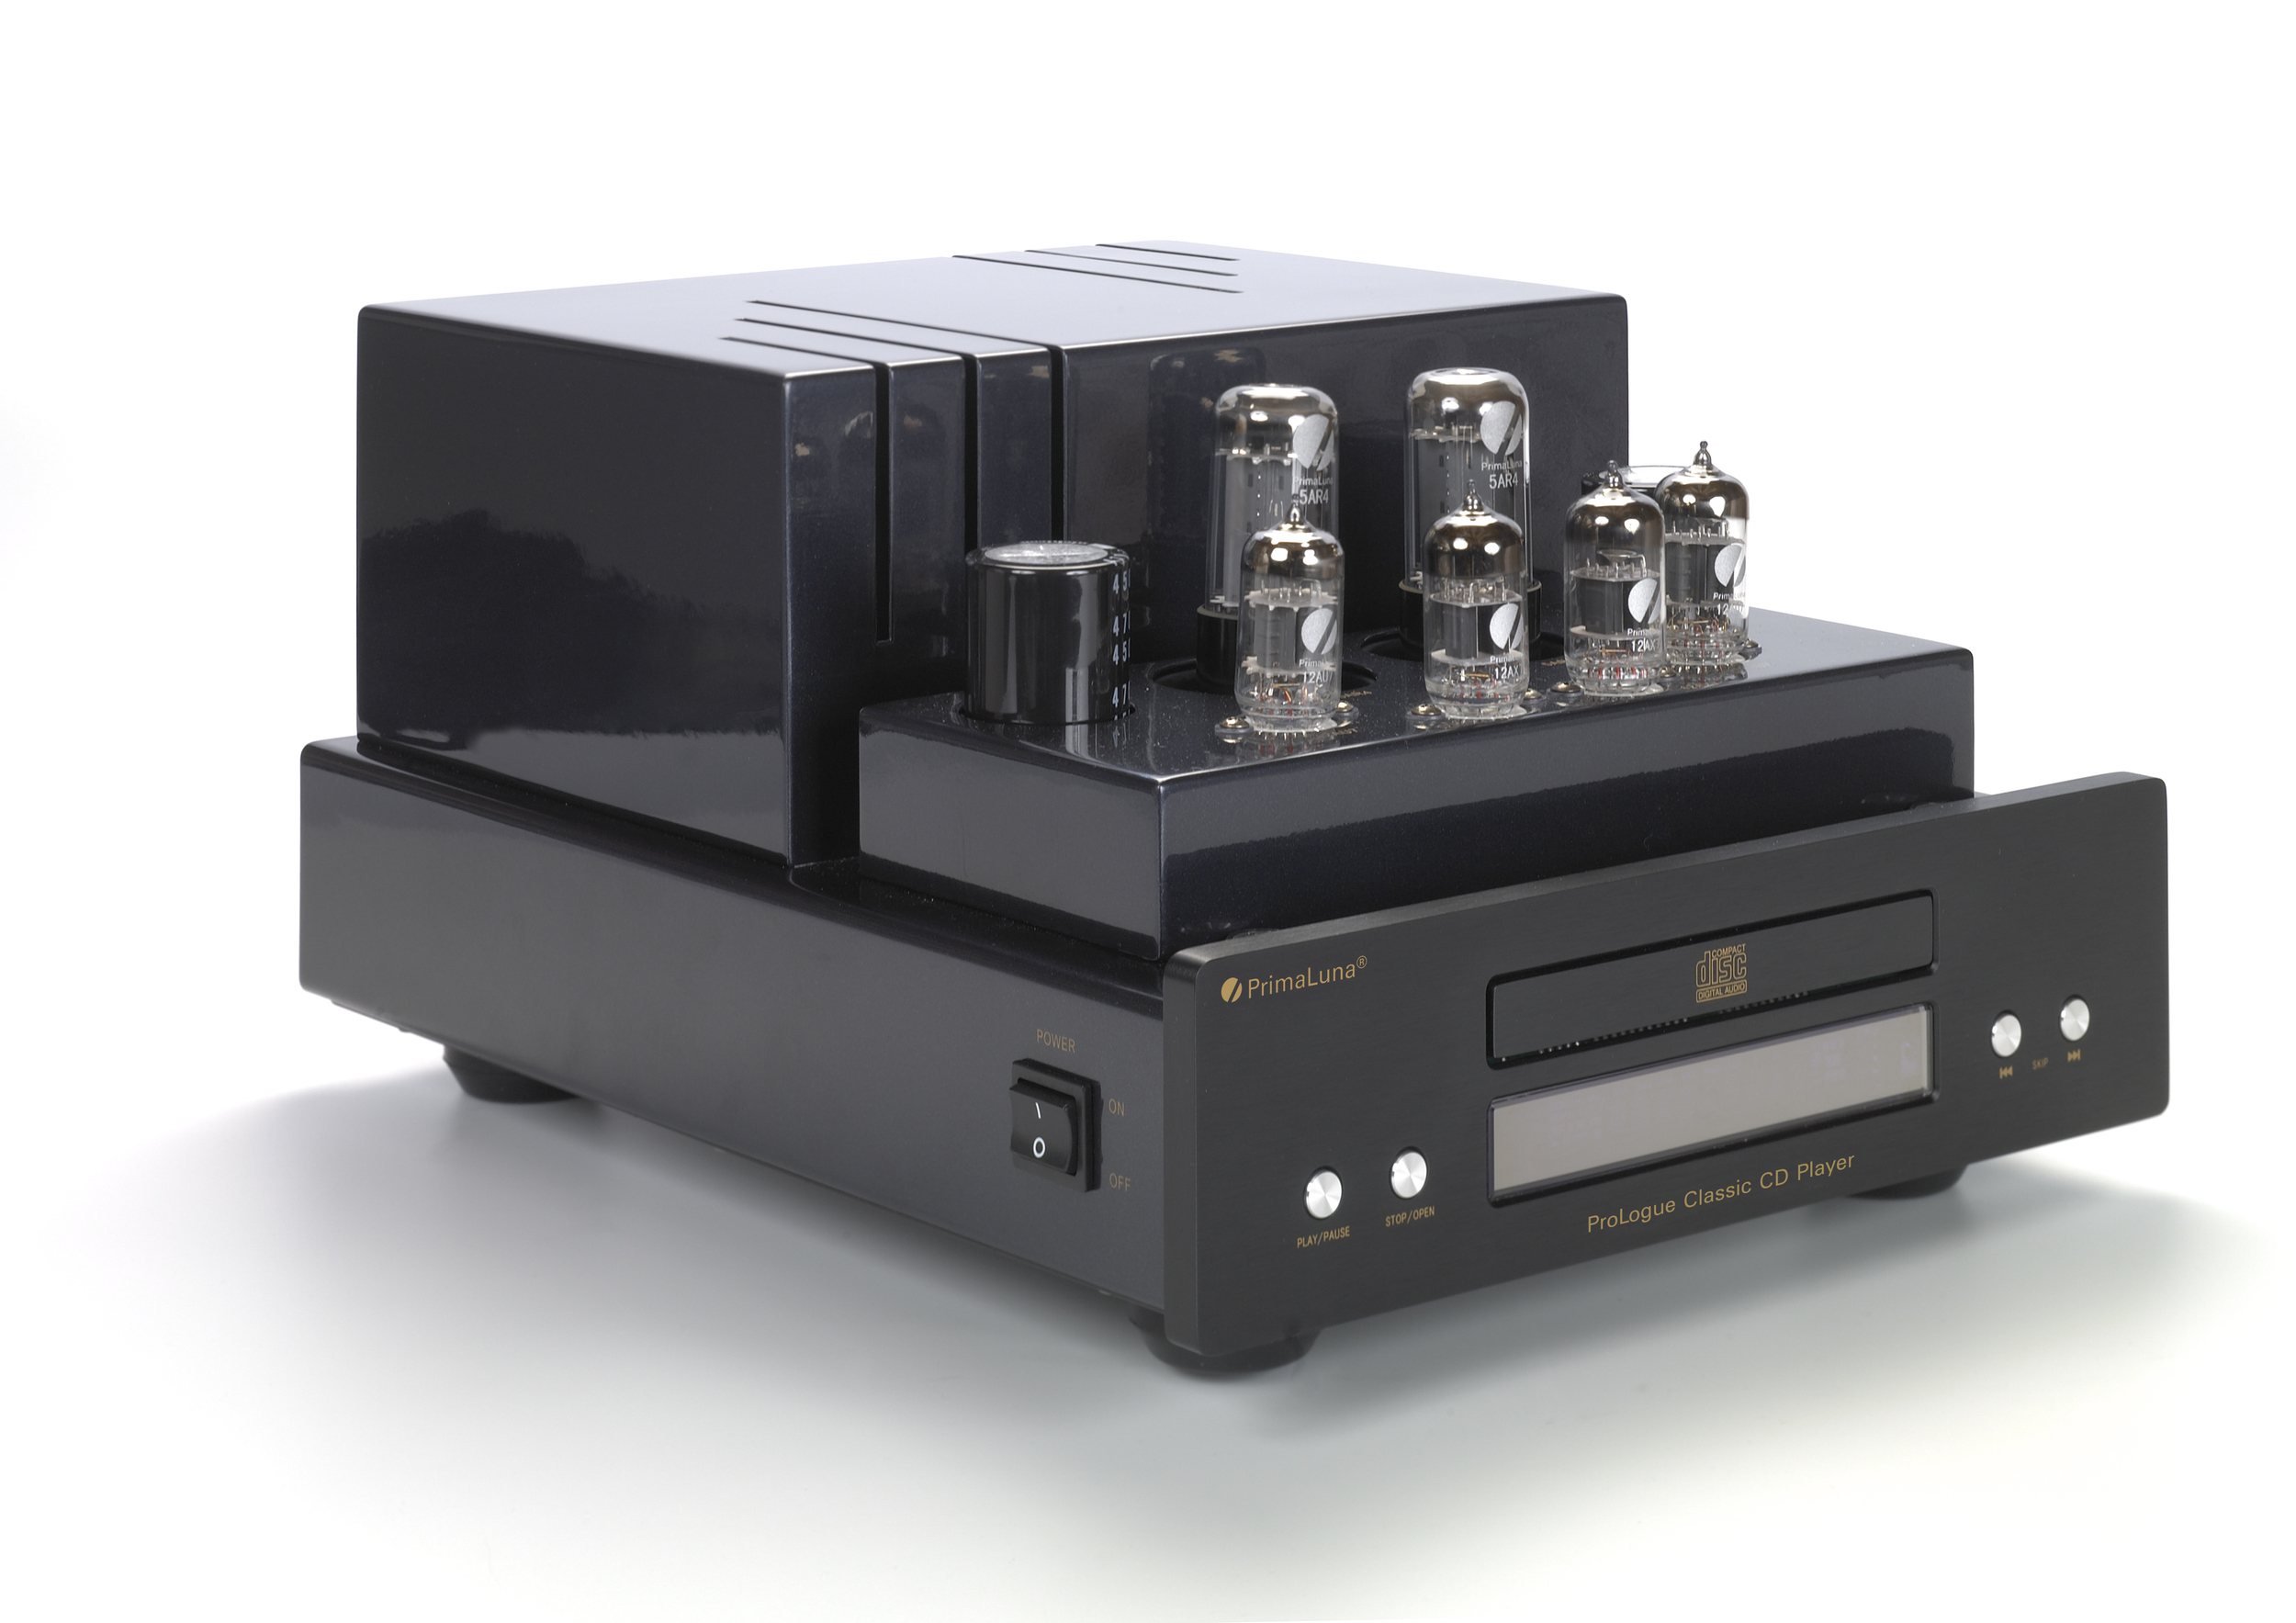 005-PrimaLuna Classic CD Player-zwart.jpg